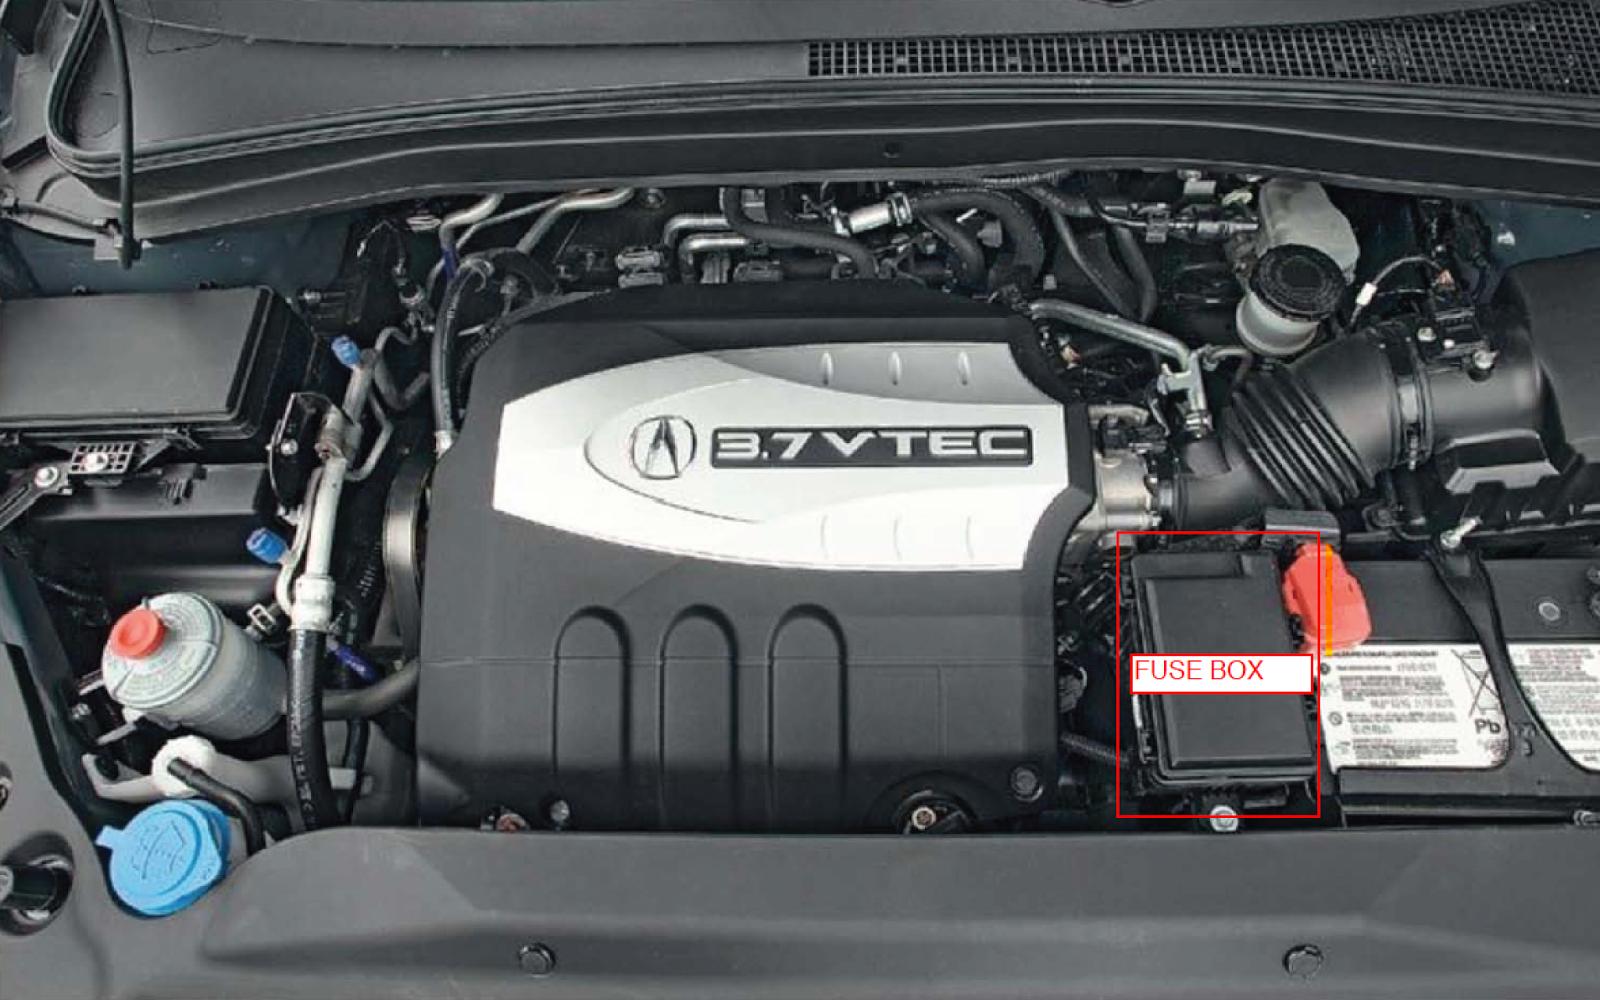 medium resolution of 2007 mdx engine fuse box identified in red